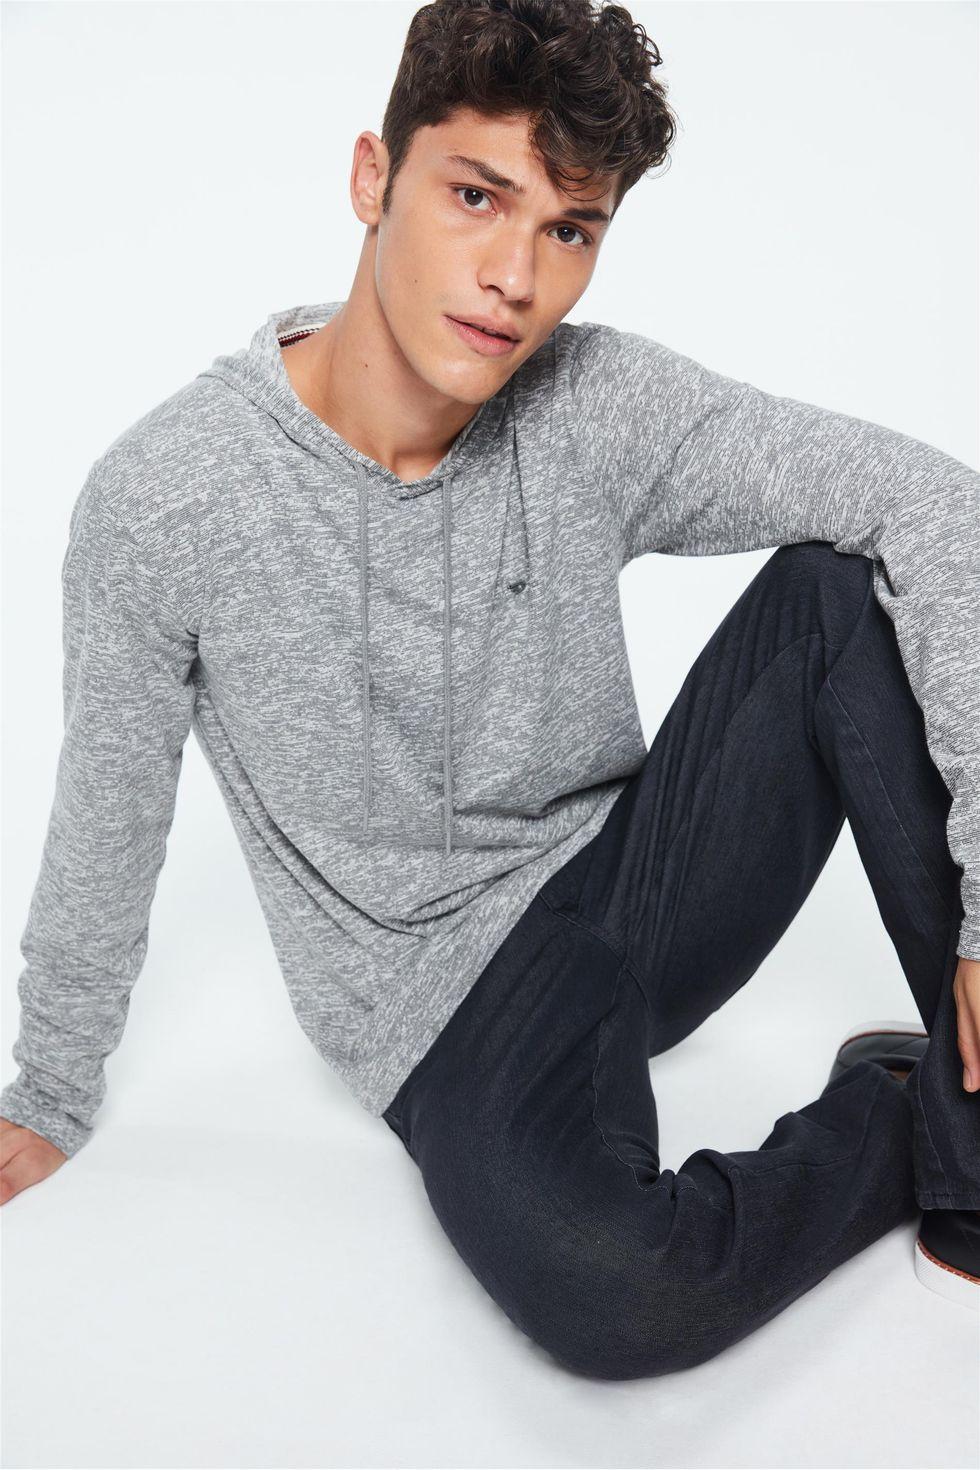 Camiseta-com-Capuz-Manga-Longa-Masculina-Frente--